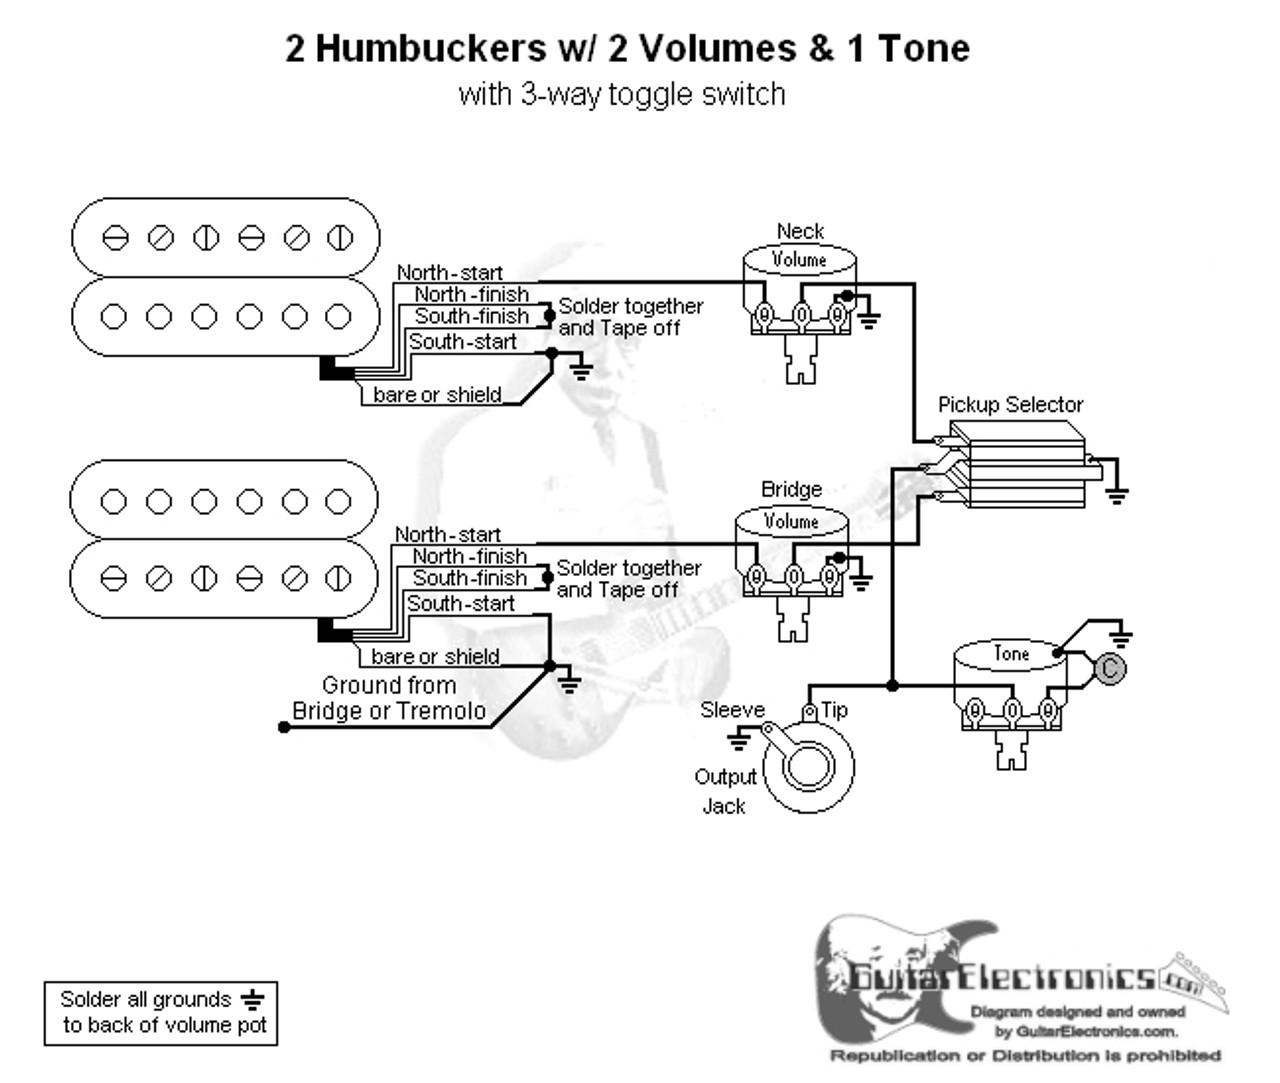 wiring diagram 2 humbucker volume 1 tone wiring diagram m2  2 b humbucker vol tone wiring diagram #7